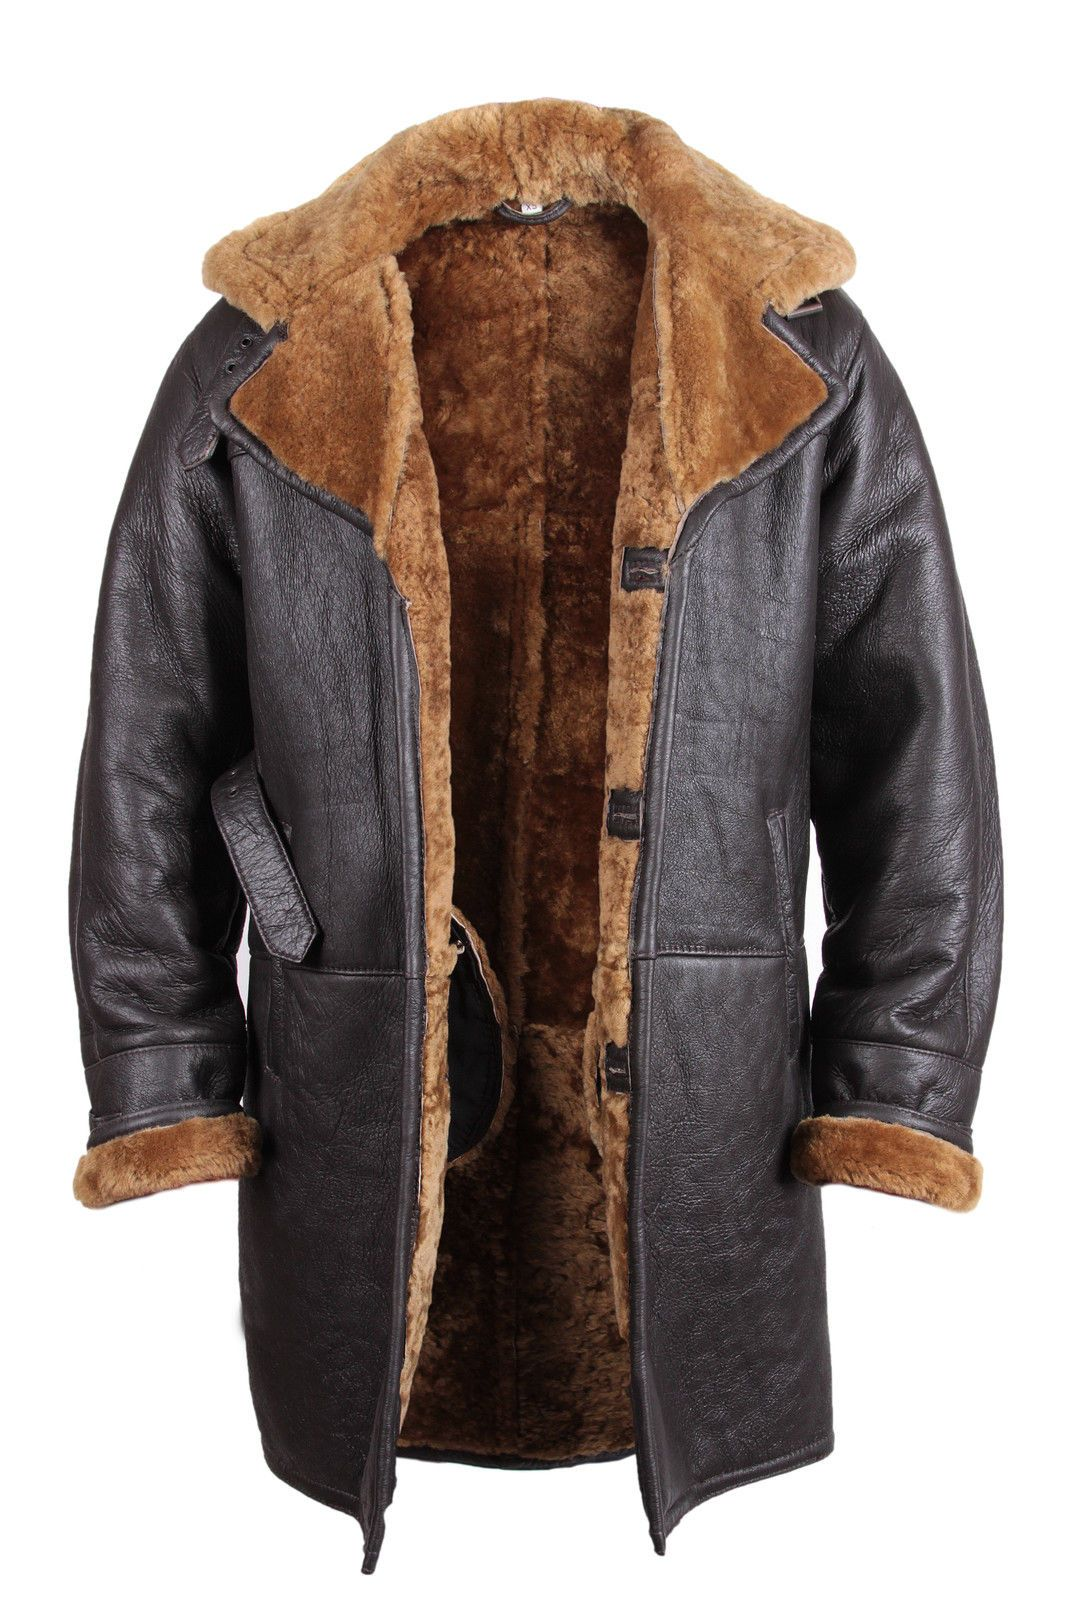 Brown MEN'S Warm Winter Real Shearling Sheepskin Leather Duffle Coat | eBay